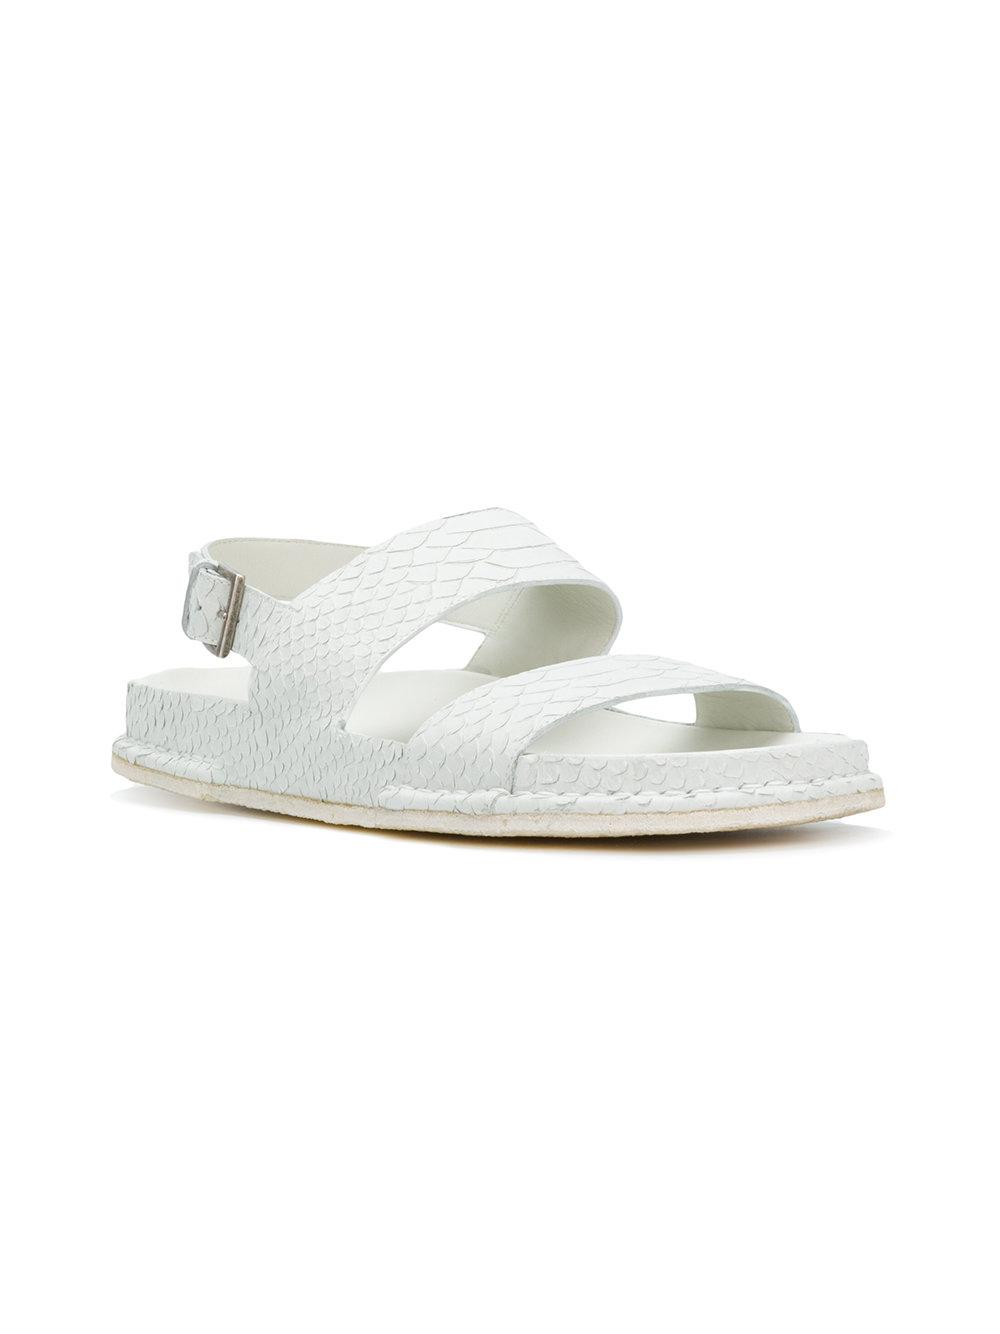 snakeskin effect buckle sandals - White Del Carlo mE8QxtZ1